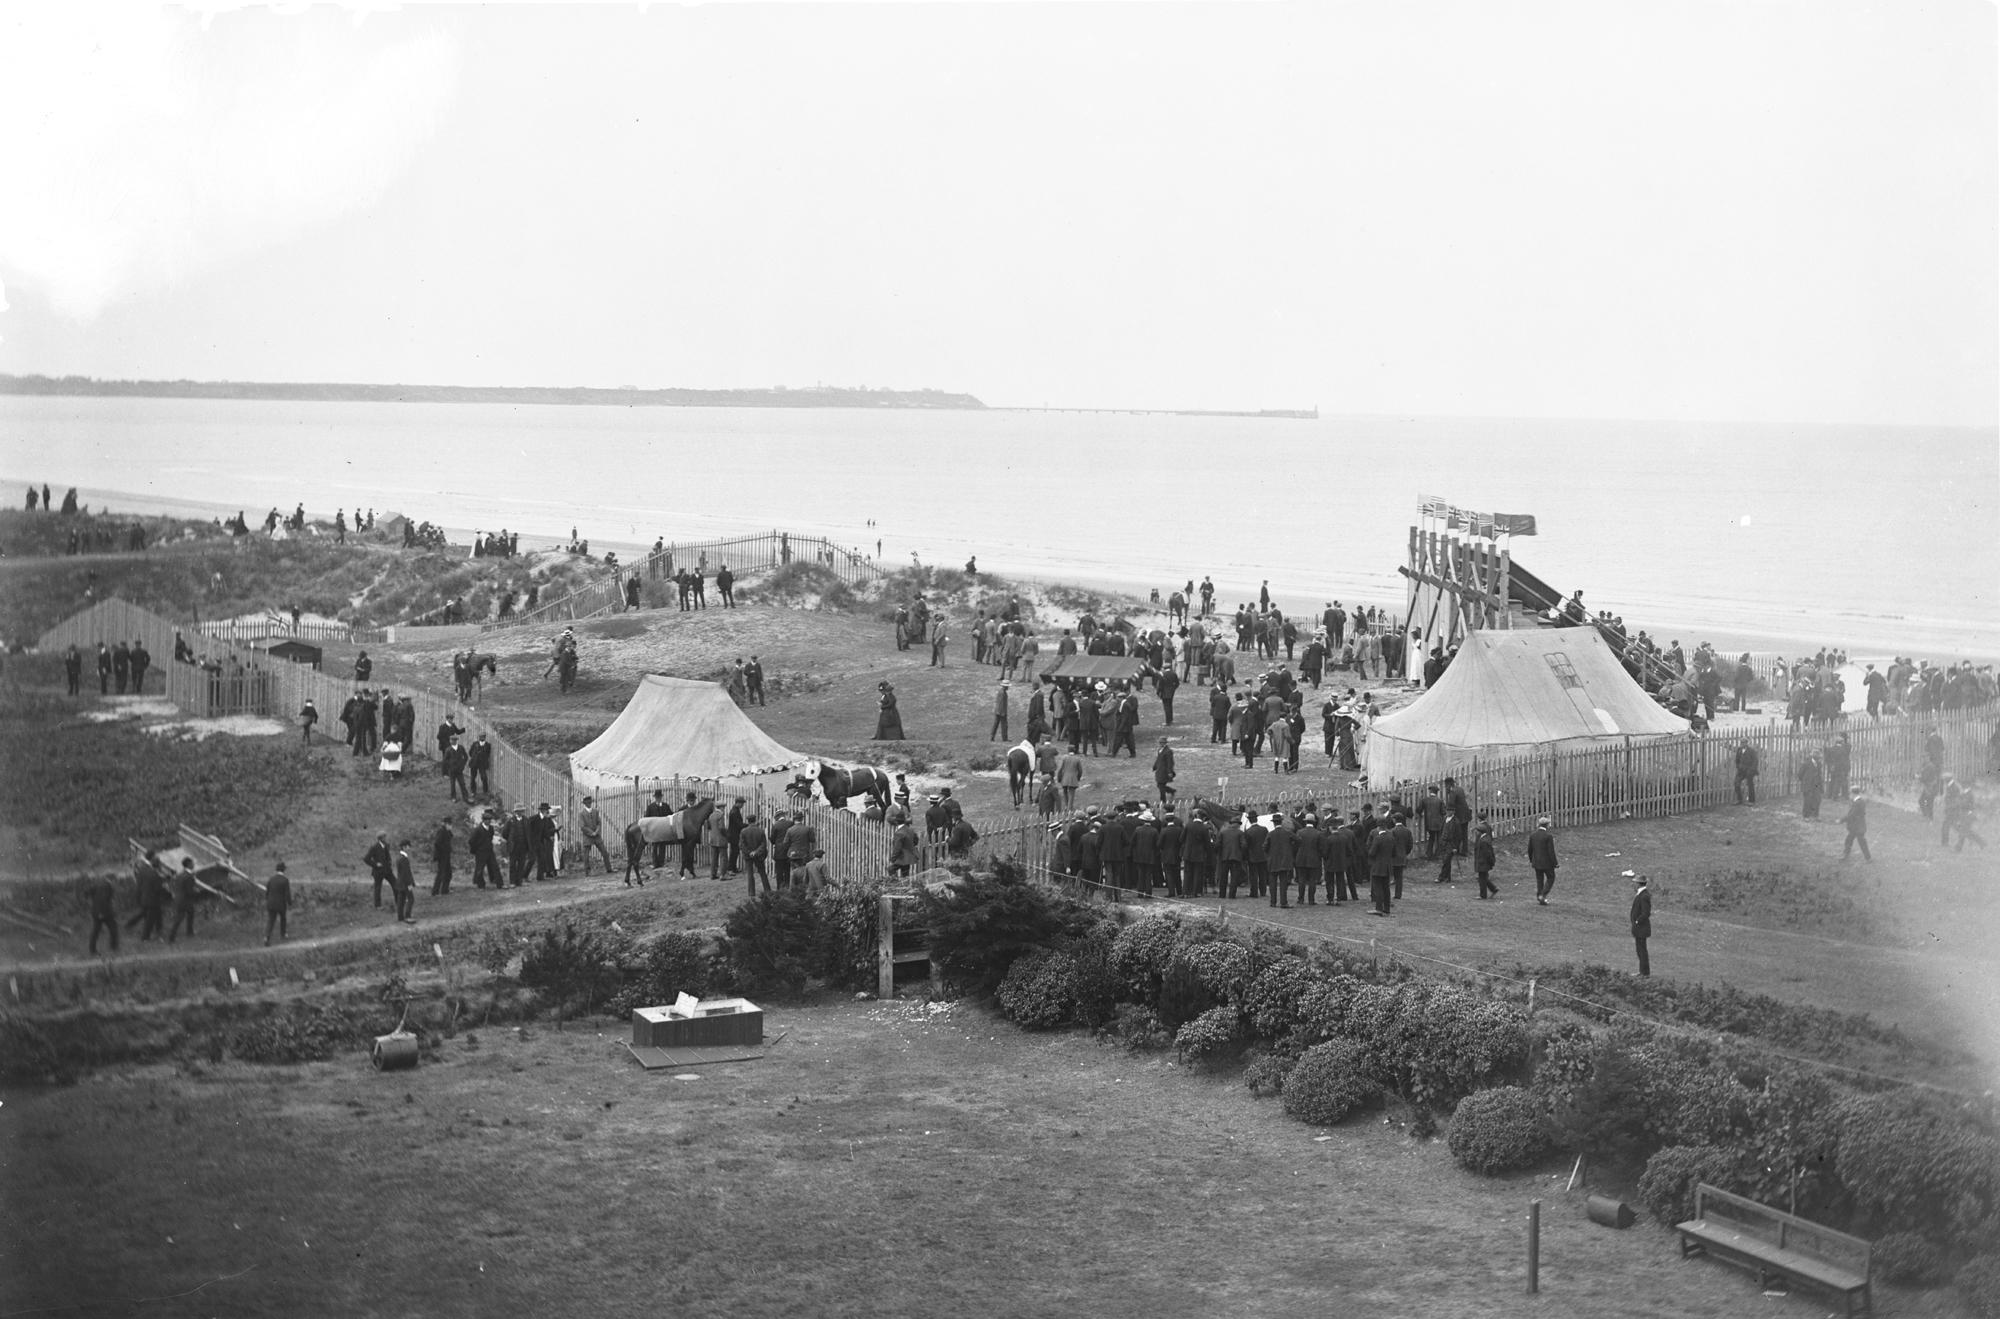 Strand Races, Rosslare